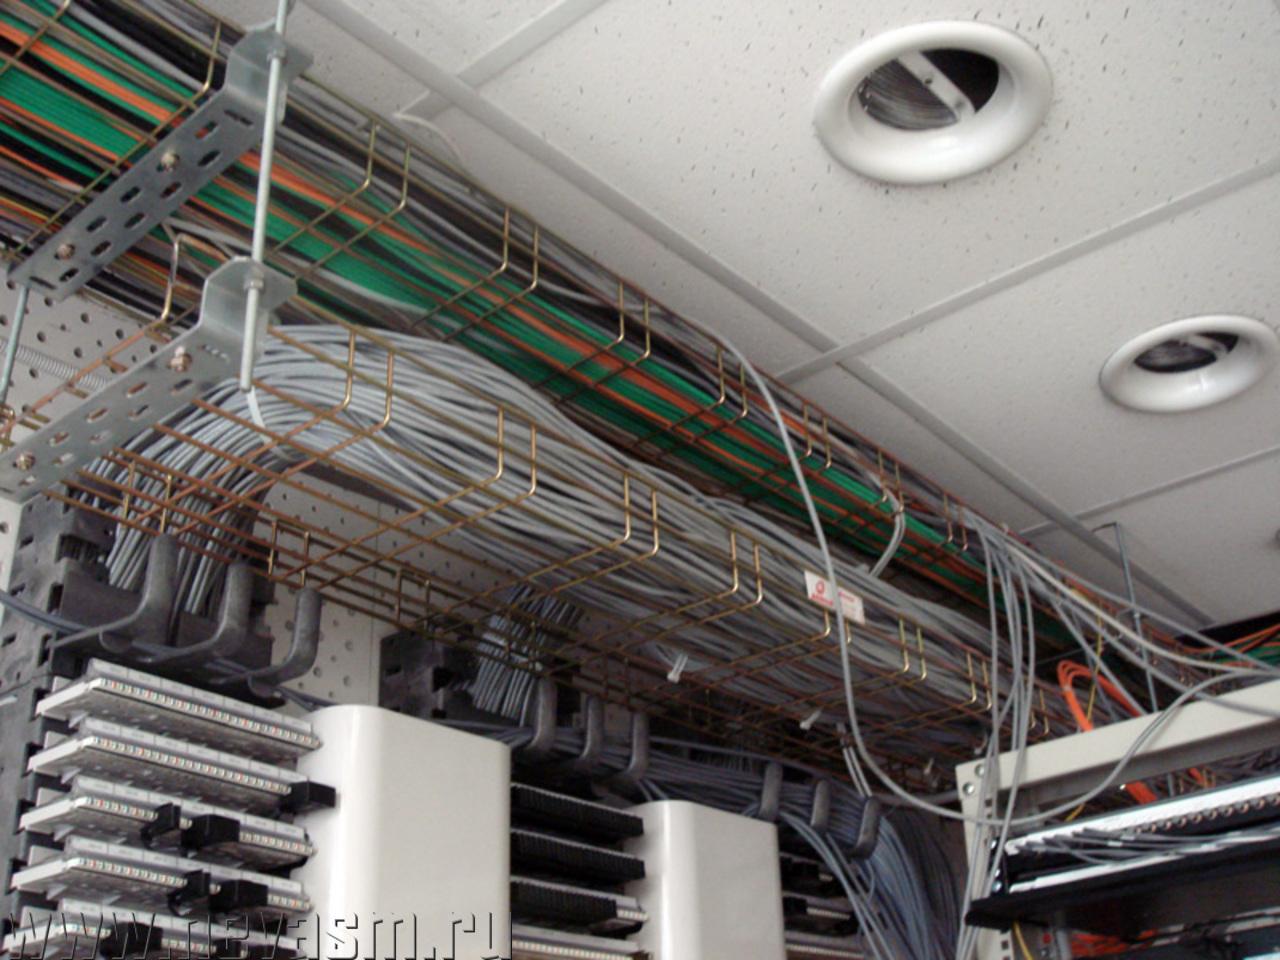 кабельные сысткмы